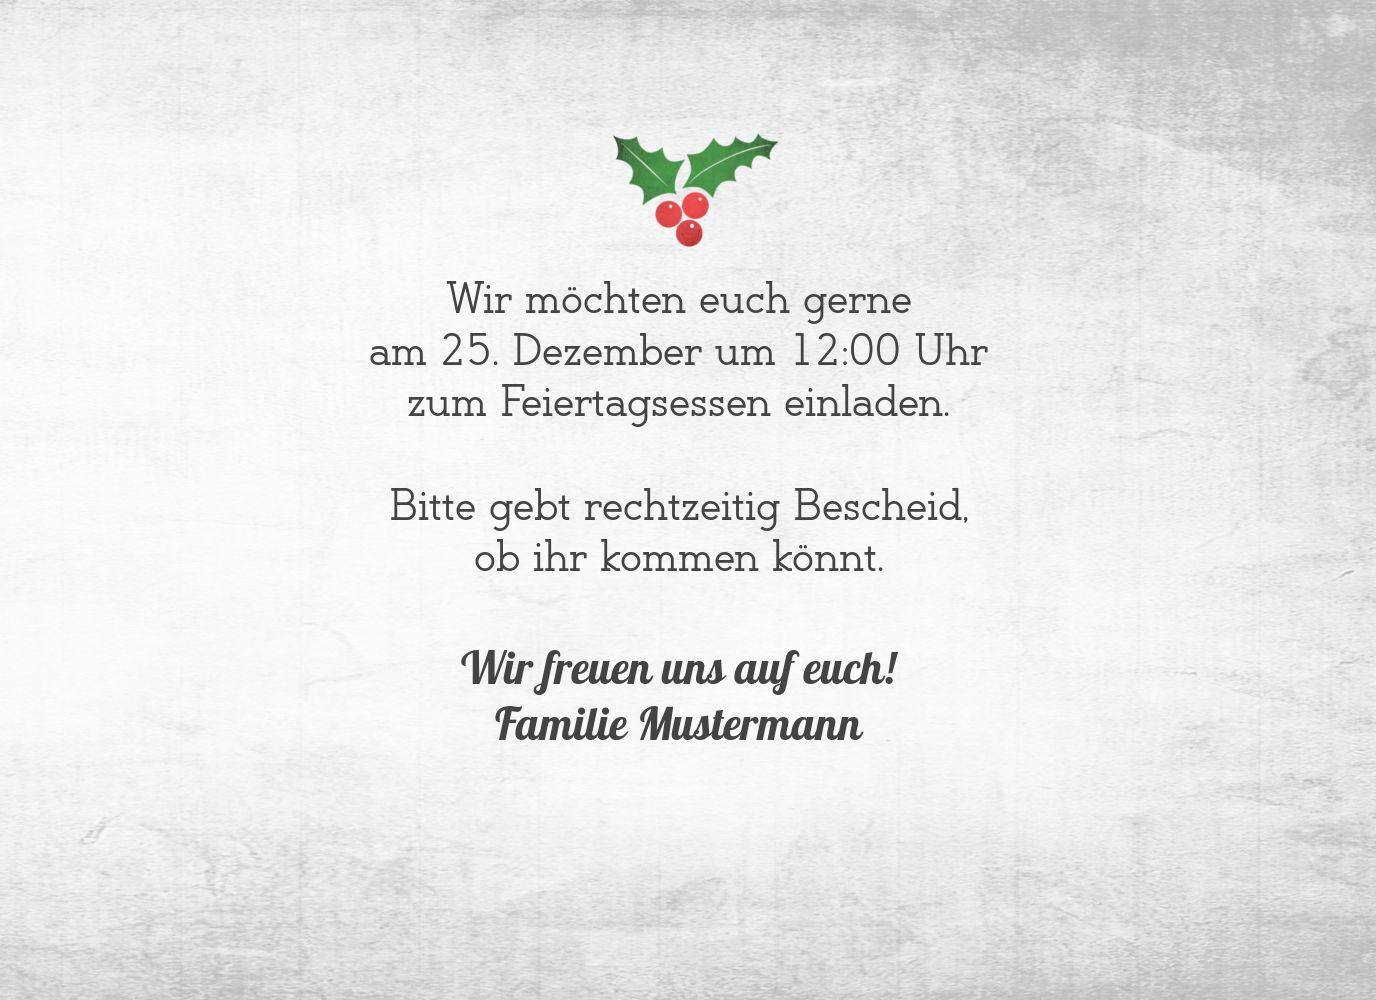 Ansicht 5 - Einladung Merry Christmas